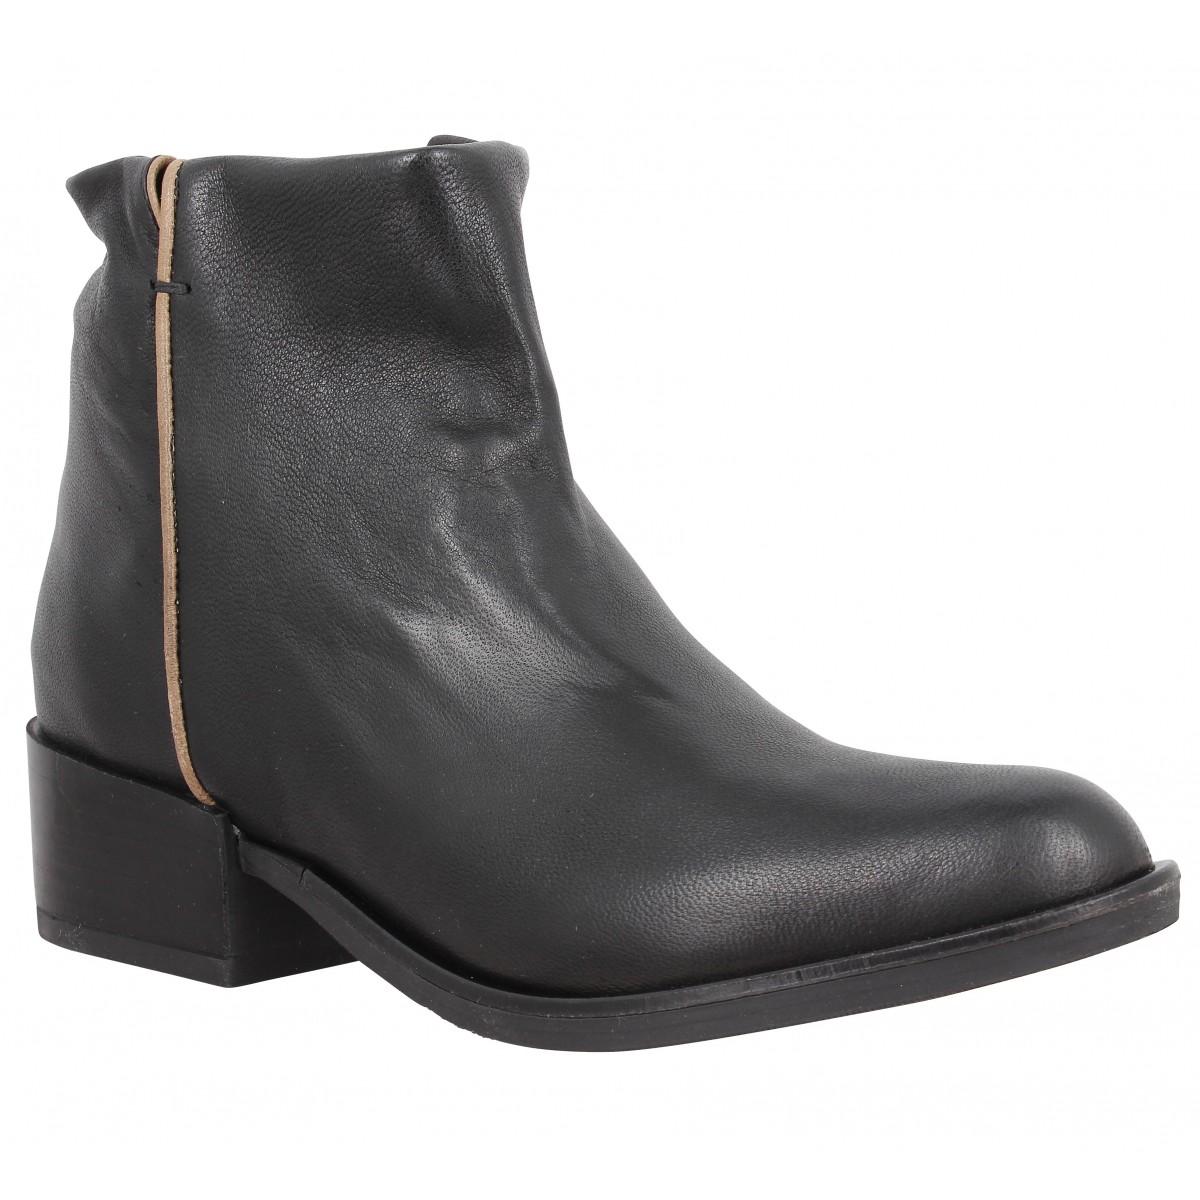 Bottines MORENA GABBRIELLI T1390 cuir Femme Noir